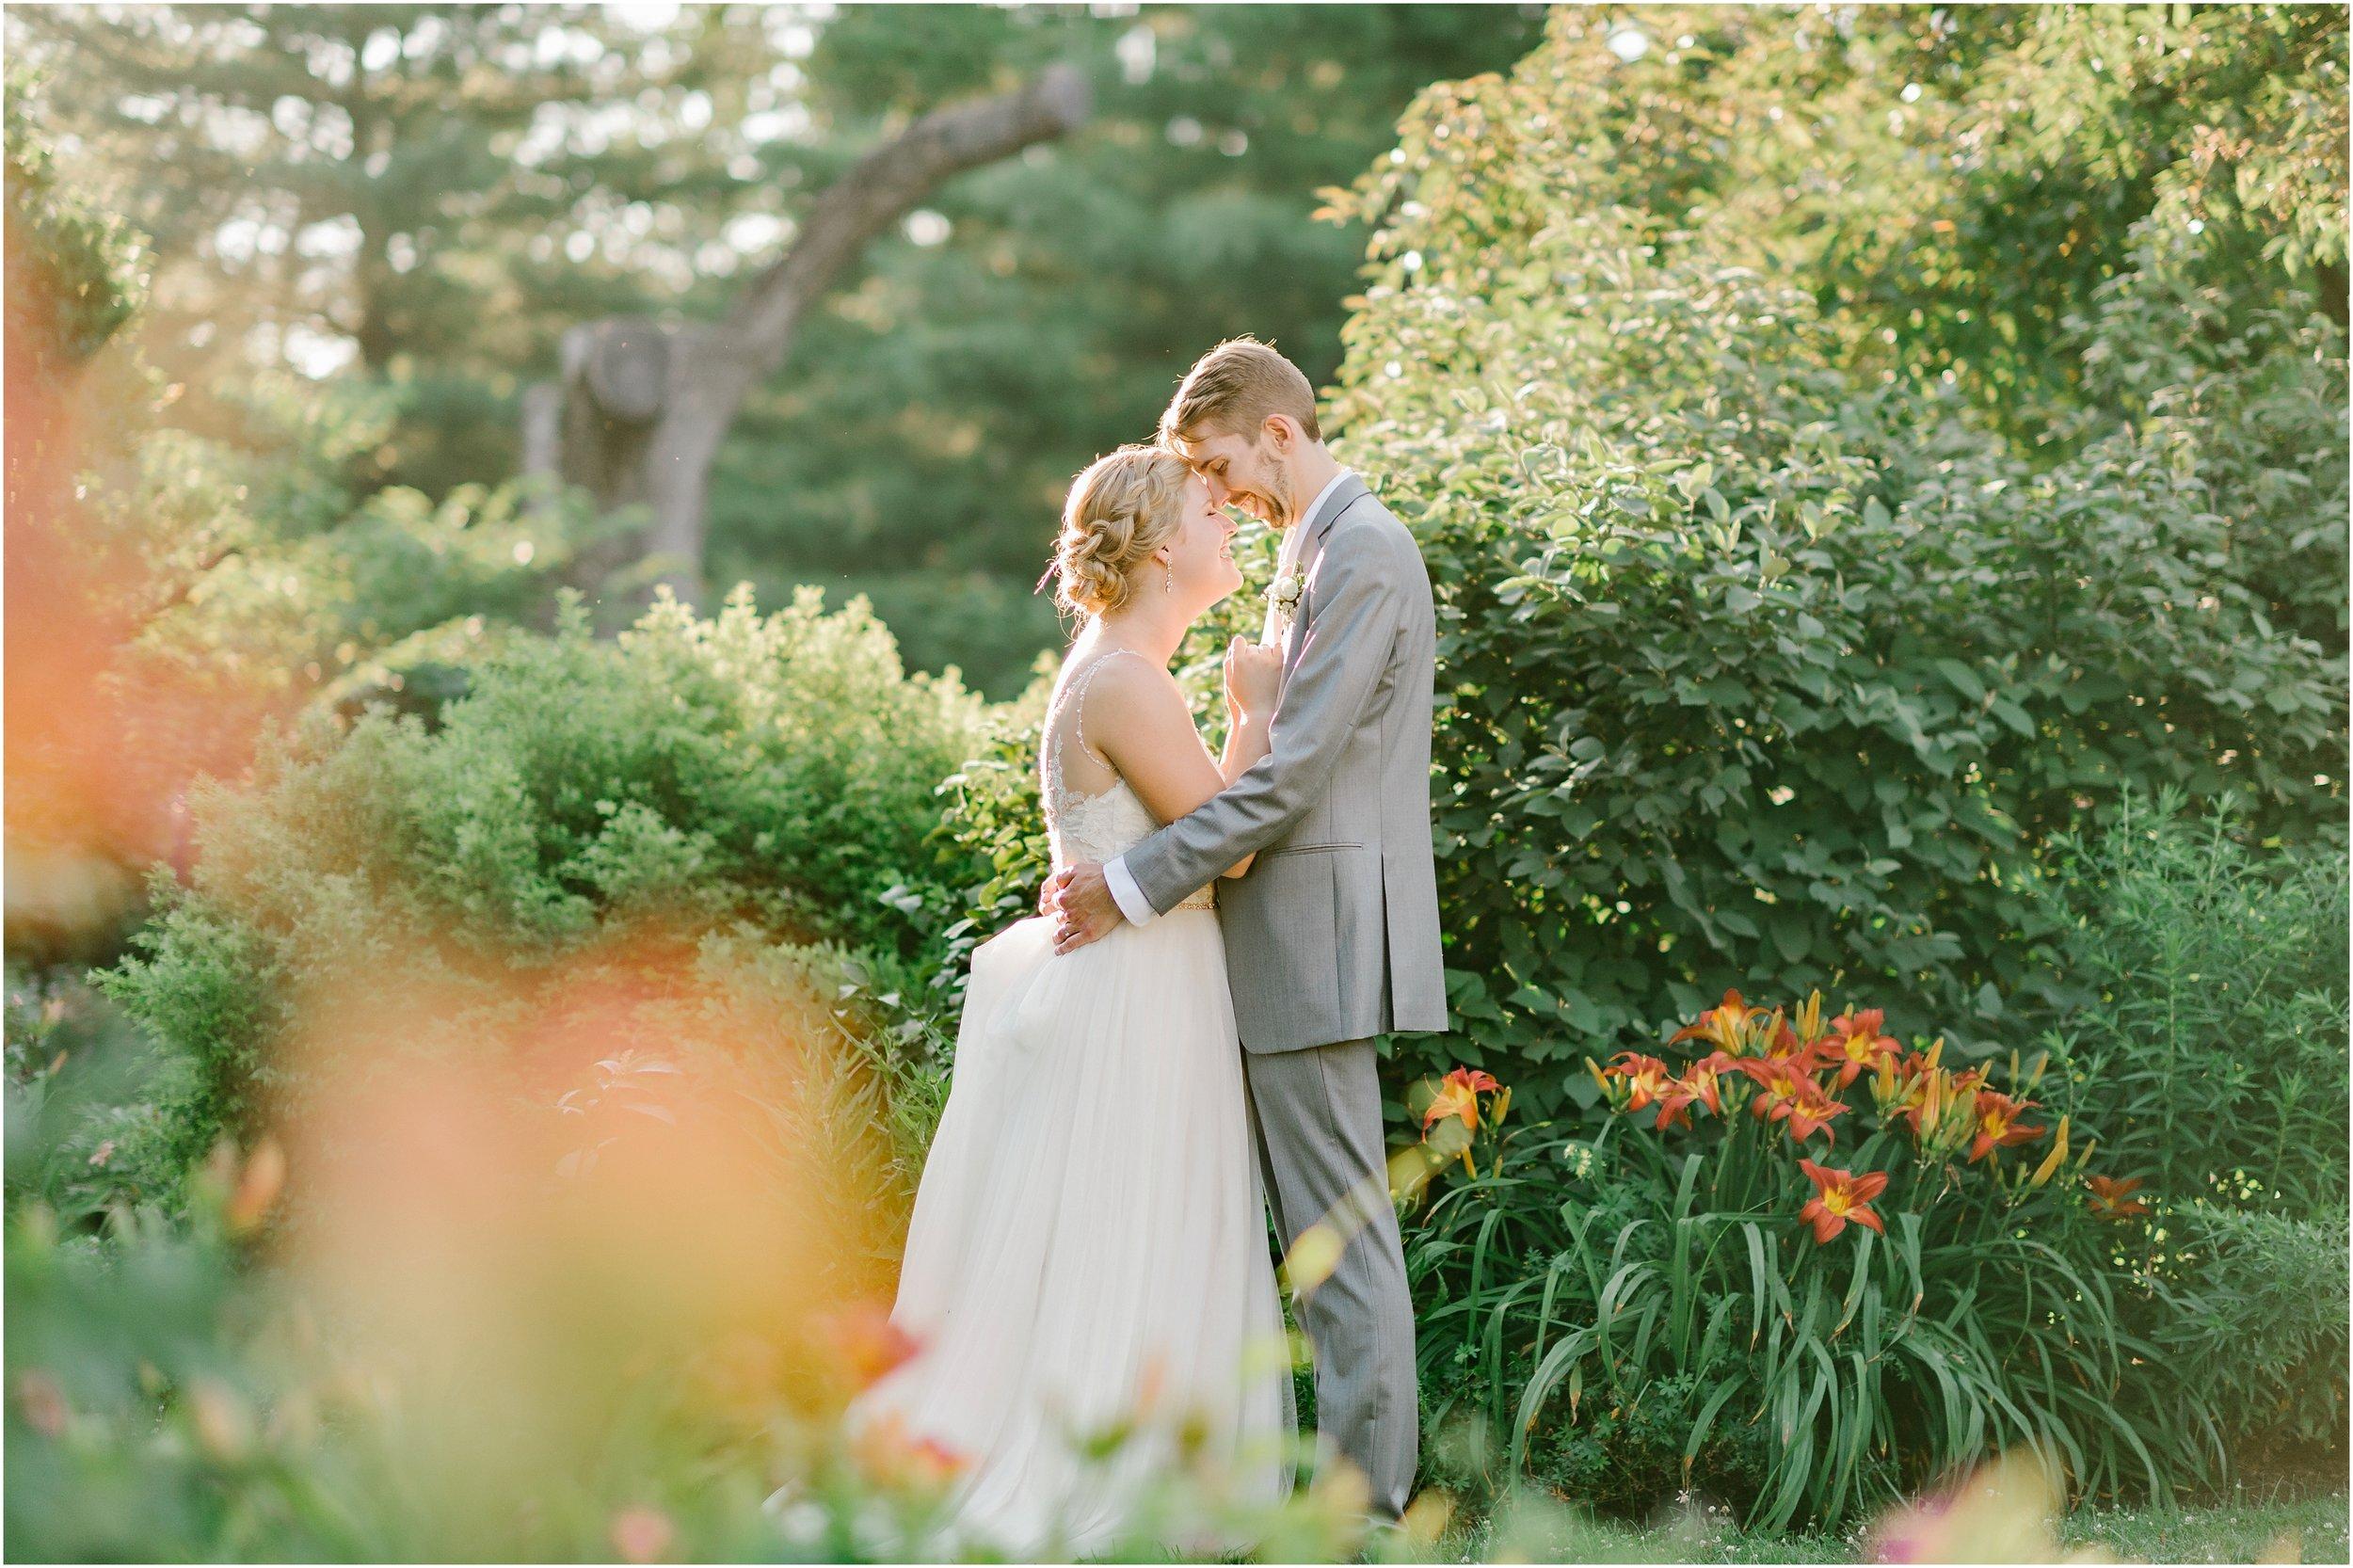 Rebecca_Shehorn_Photography_Indianapolis_Wedding_Photographer_8522.jpg